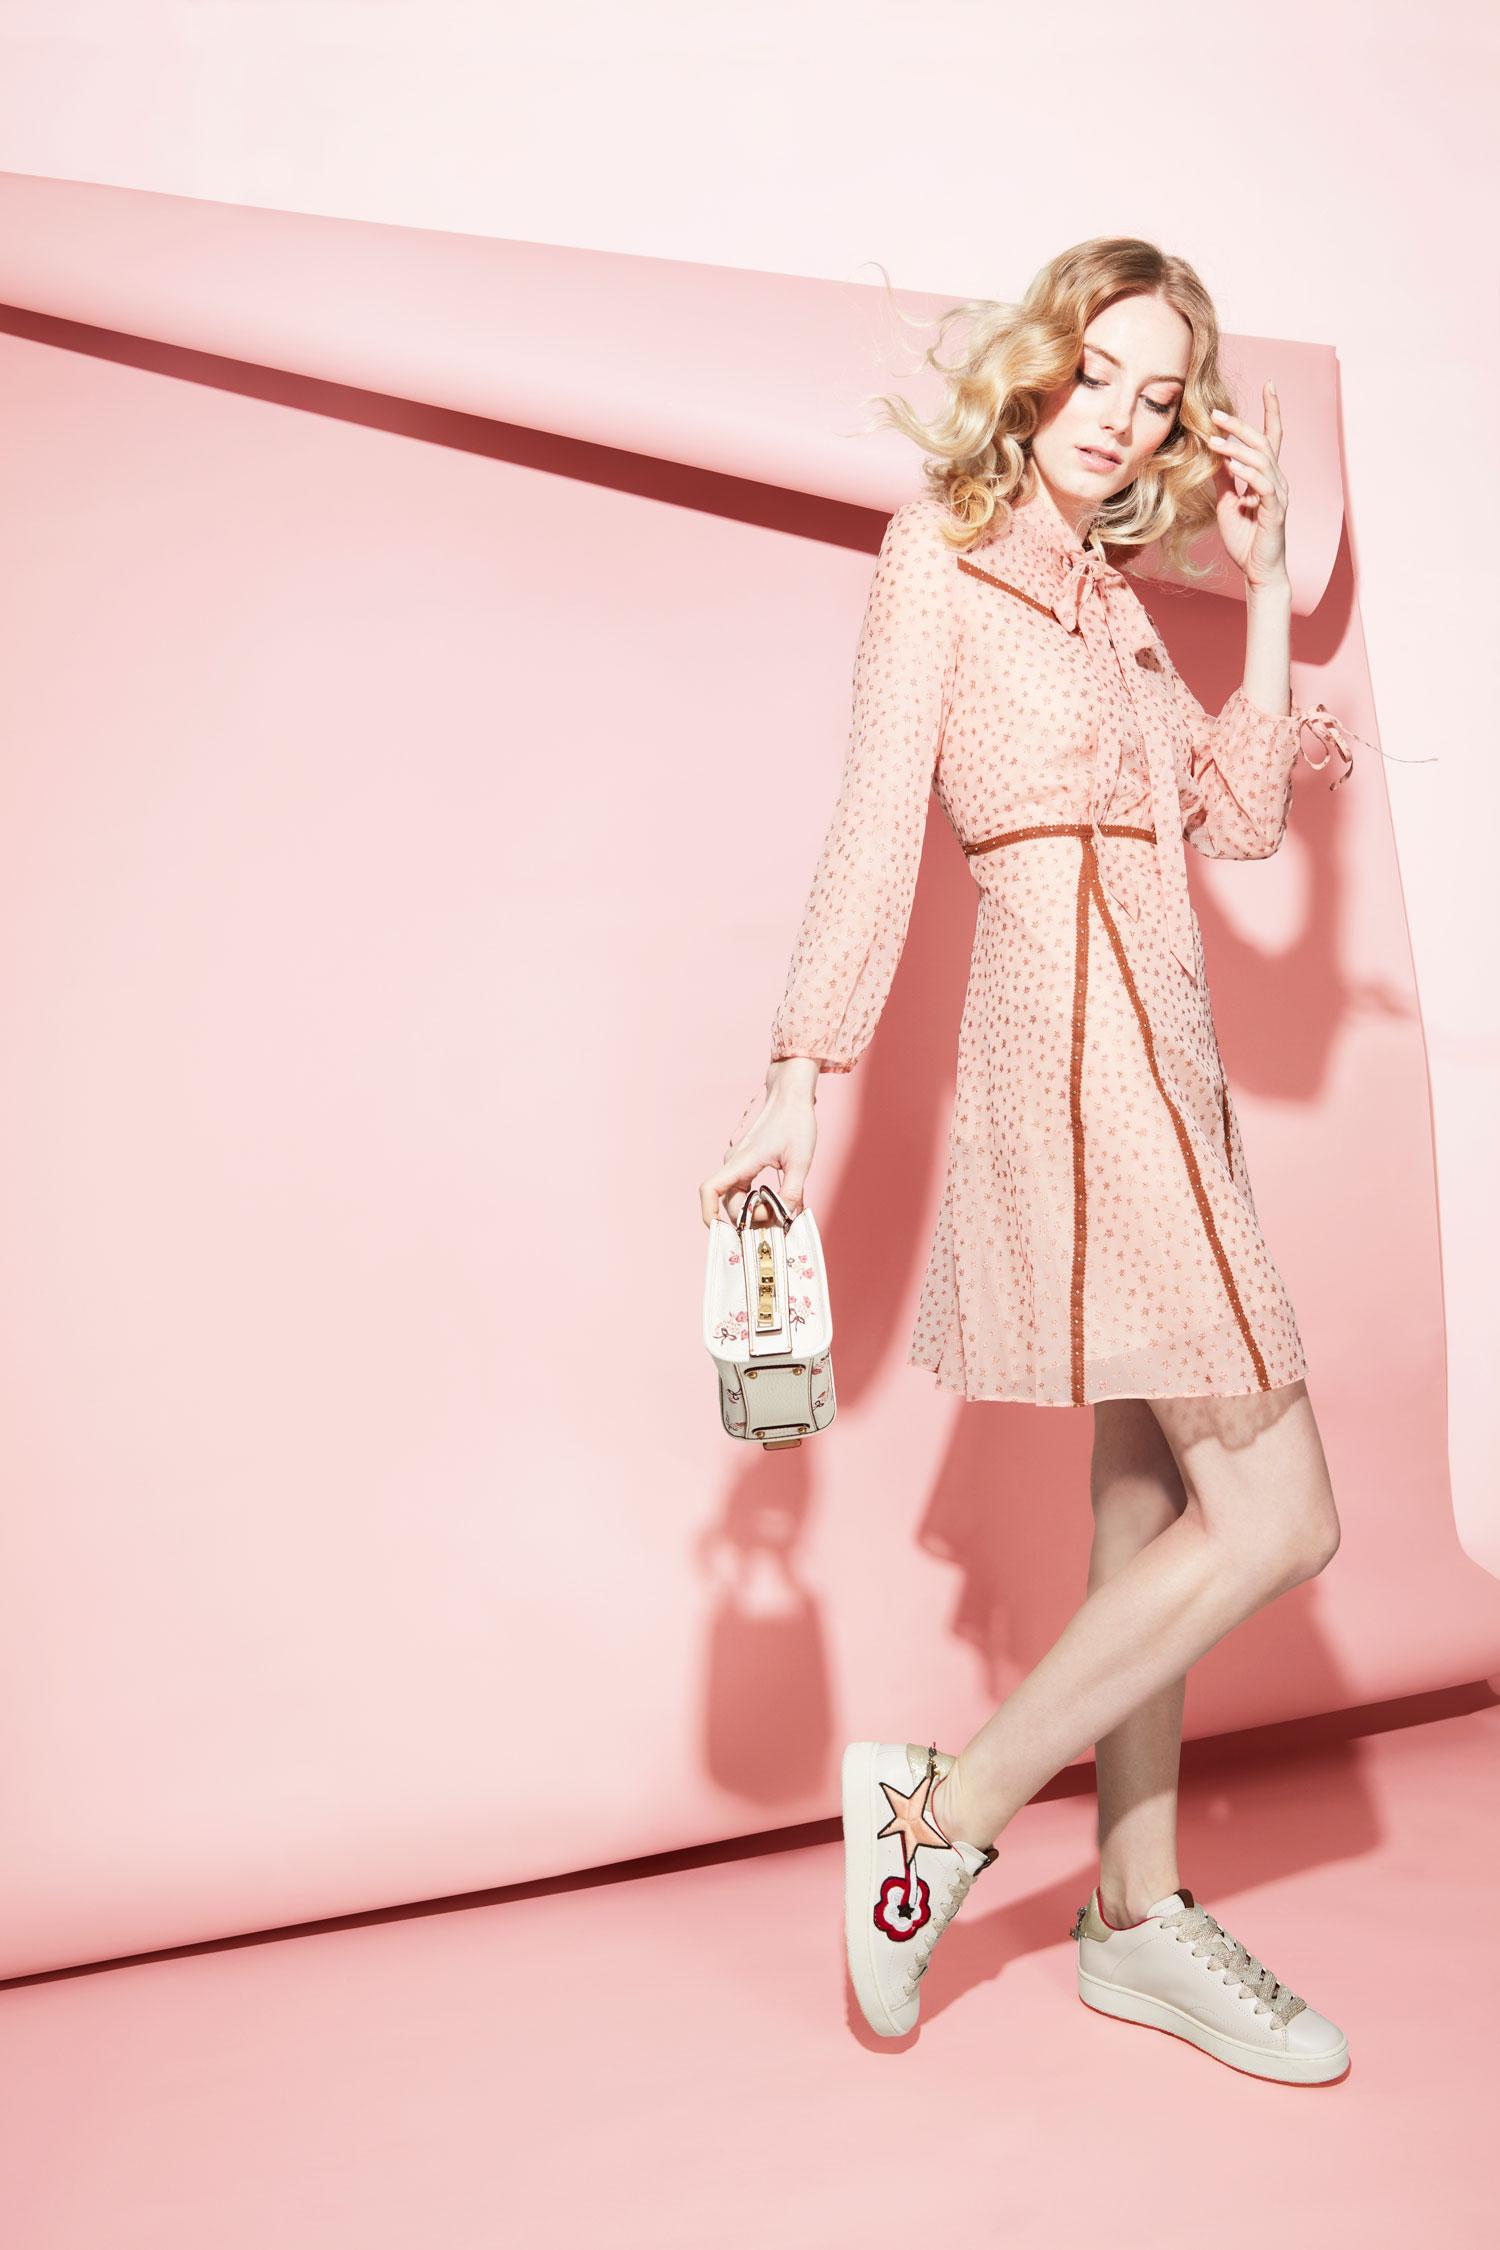 sarah-cochran-creative-stylist-wardrobe-stylist-creative-director-minneapolis-st-paul-14.jpg